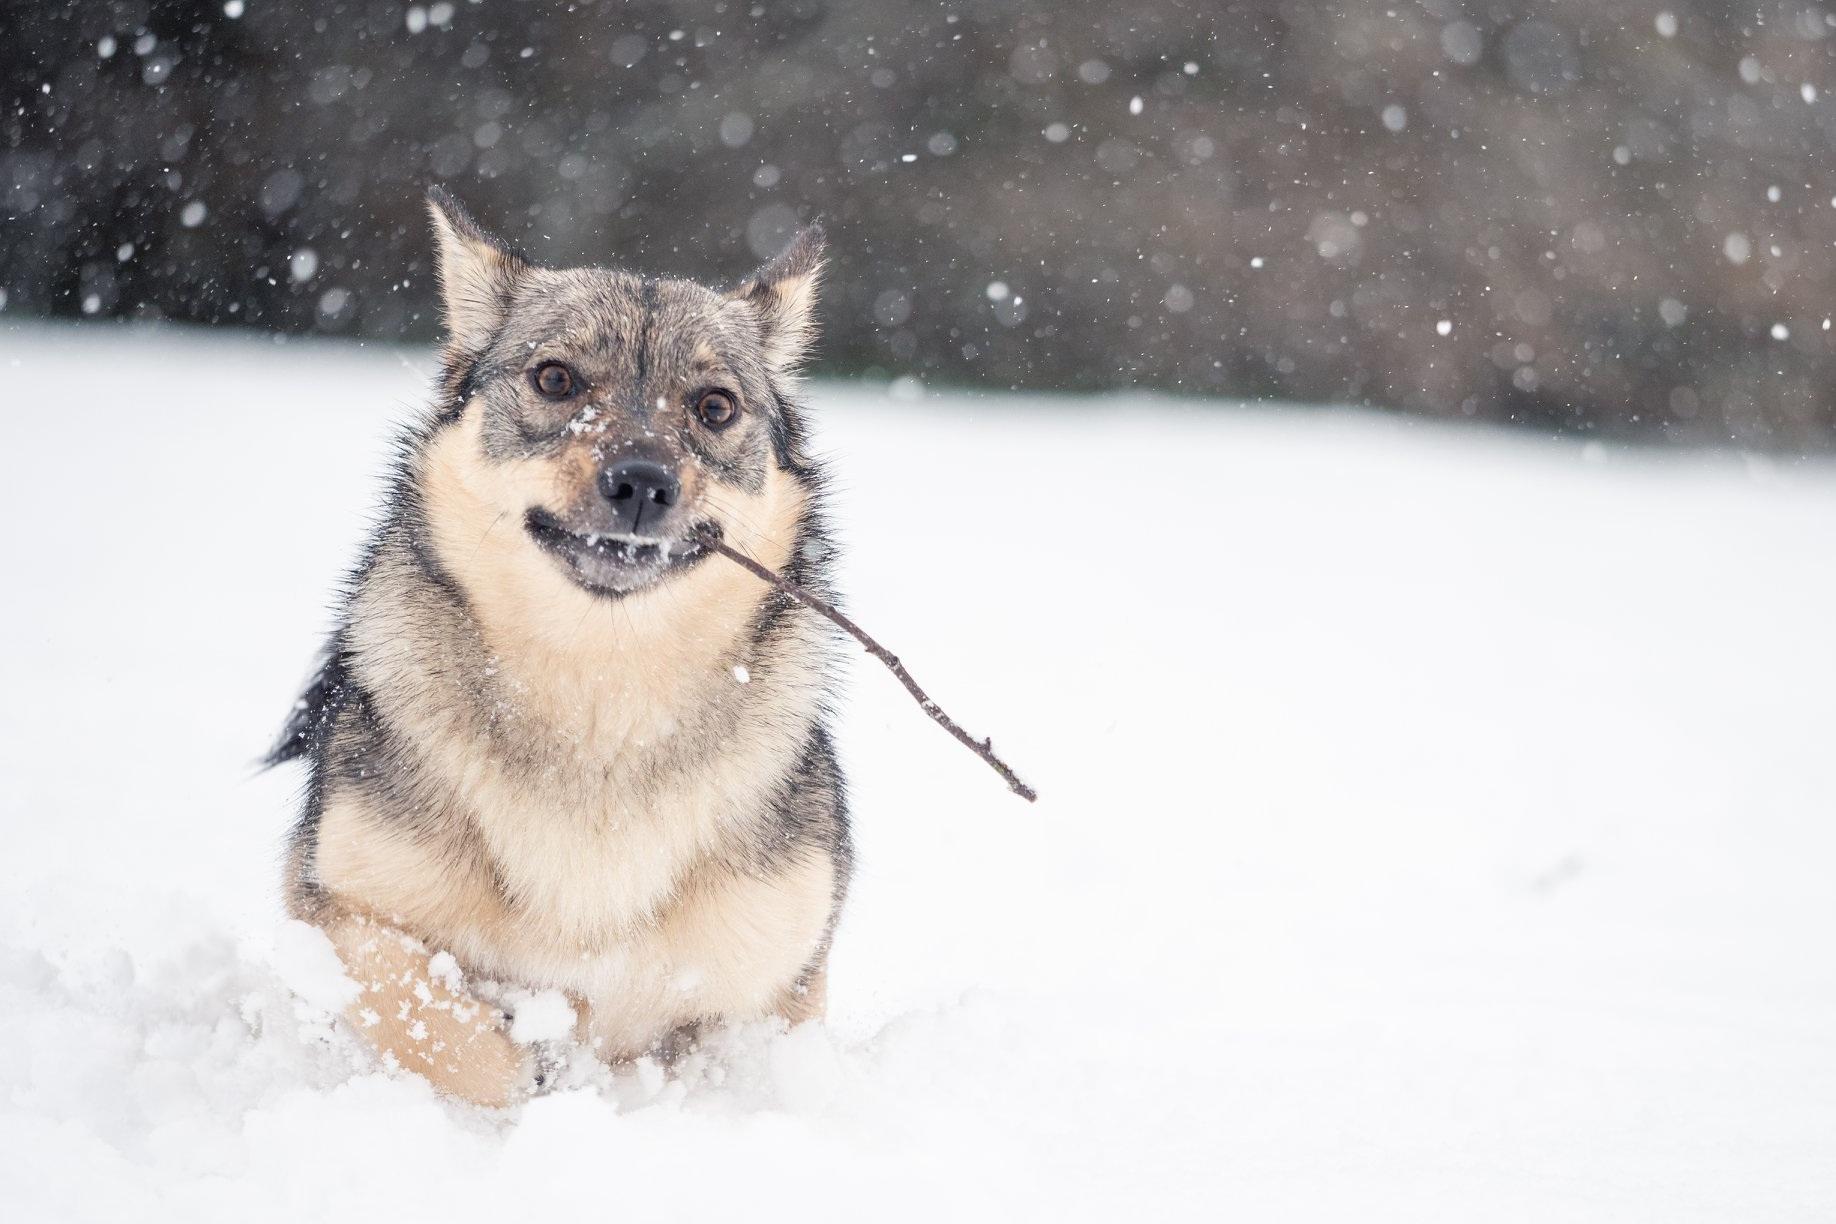 Marcie+Snow